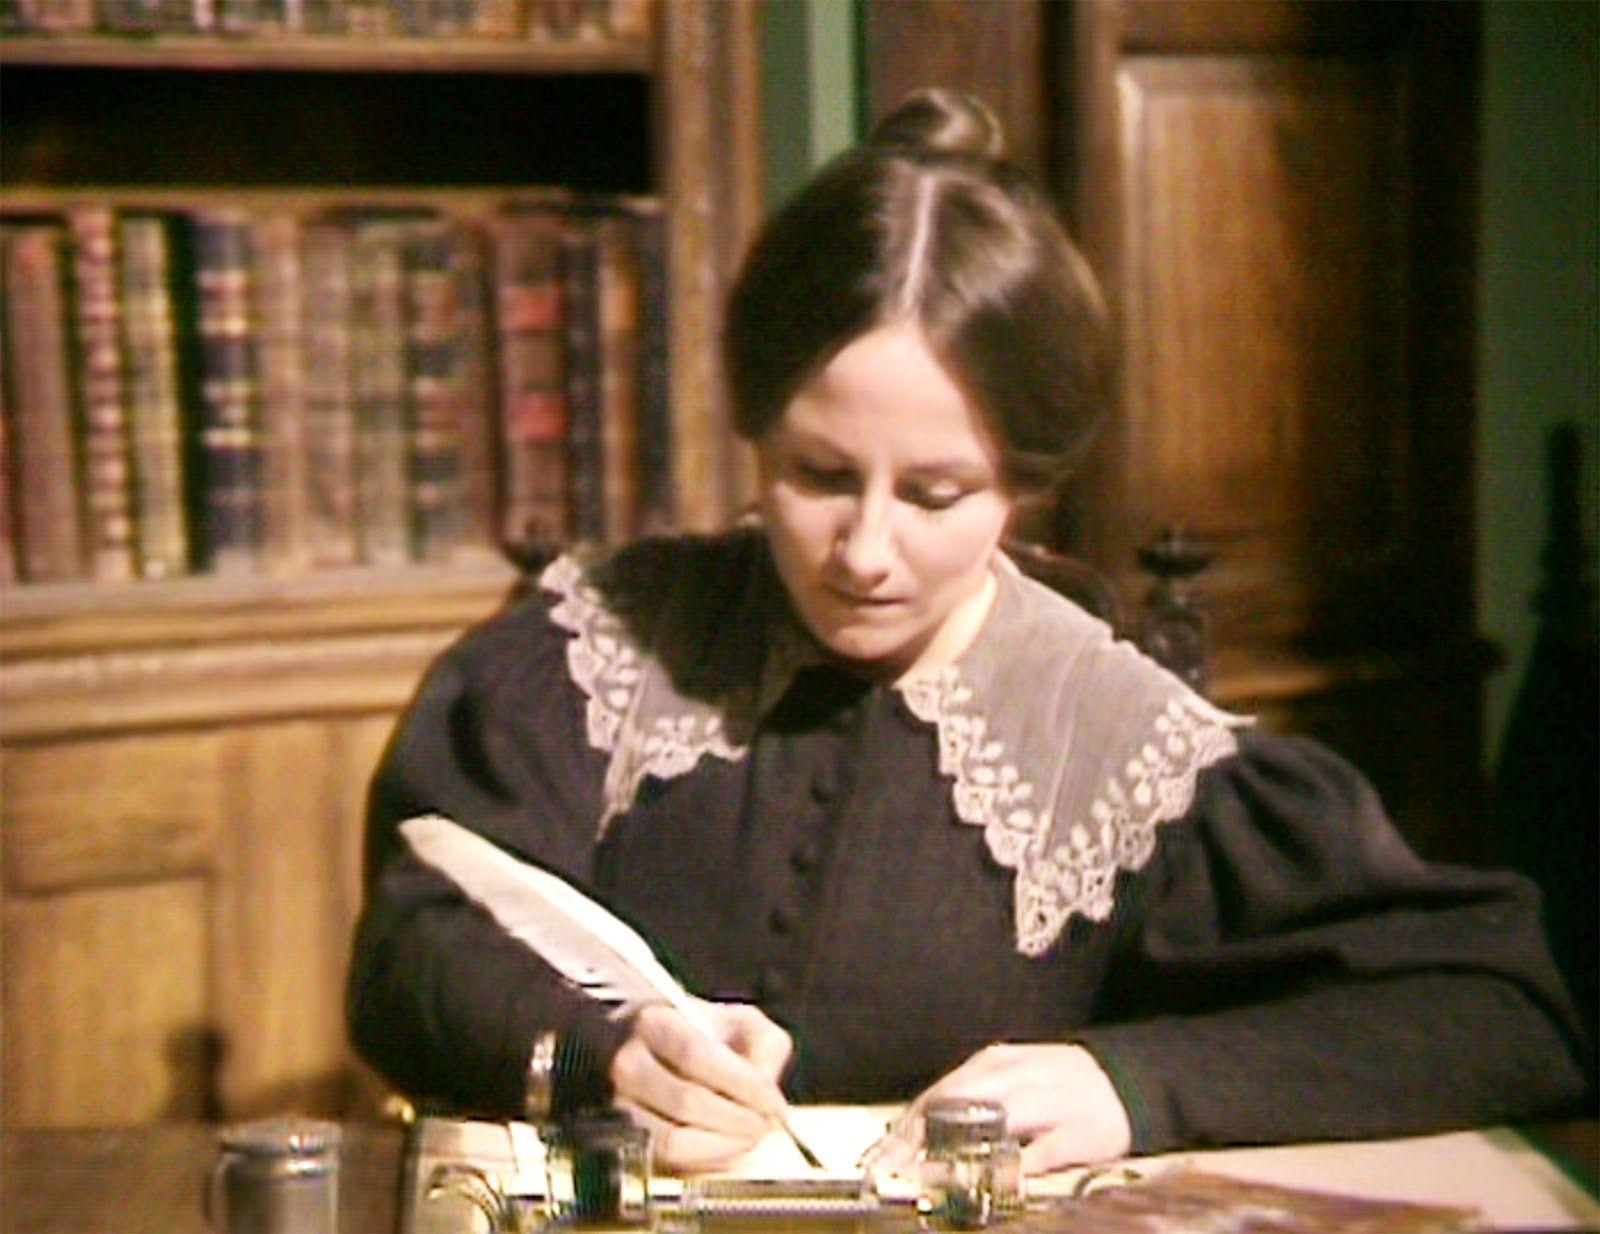 jane eyre 1983 - Zelah Clarke | Seriale | Pinterest | Jane ...